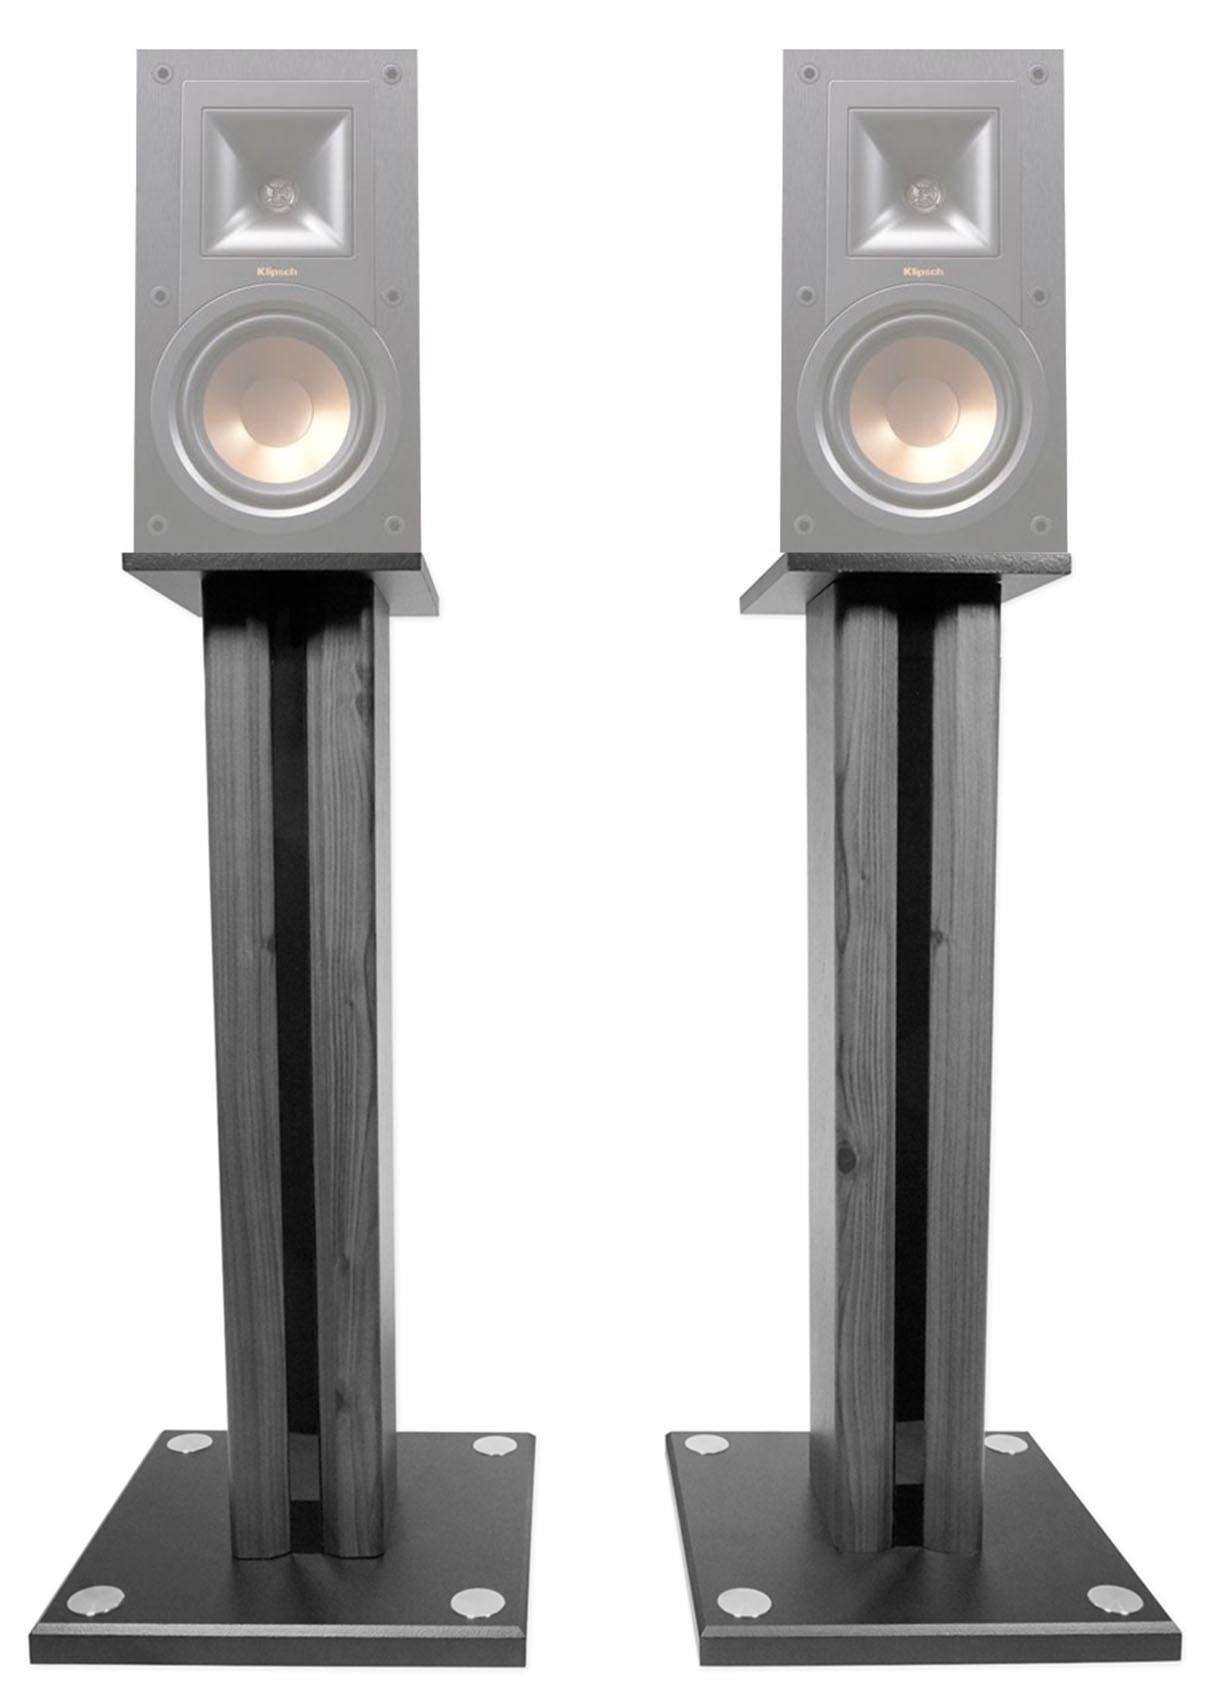 "Pair 26"" Bookshelf Speaker Stands For Klipsch R-15PM Bookshelf Speakers by Technical Pro"